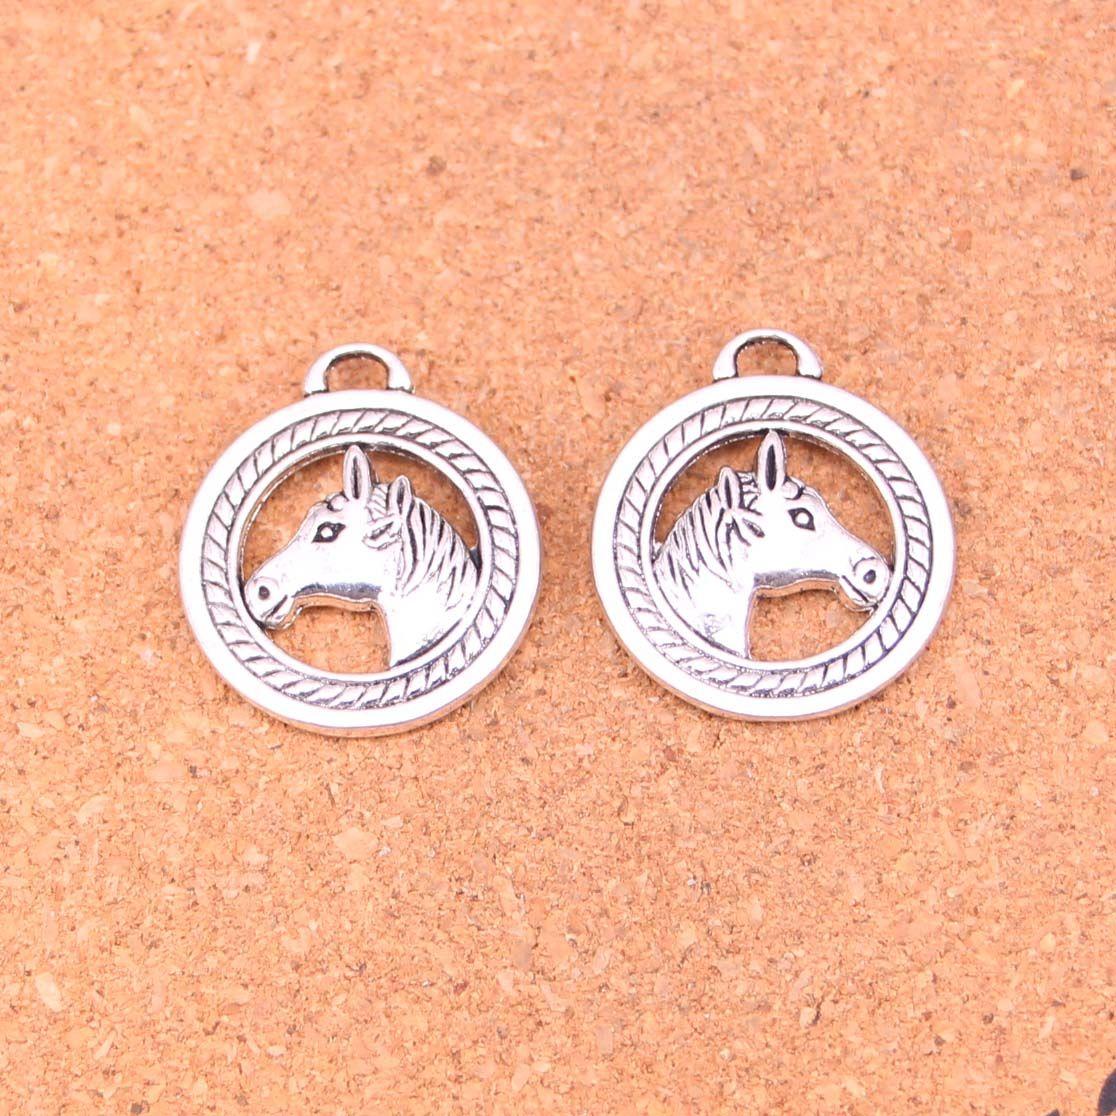 35pcs Antique silver Charms horse head Pendant Fit Bracelets Necklace DIY Metal Jewelry Making 25mm